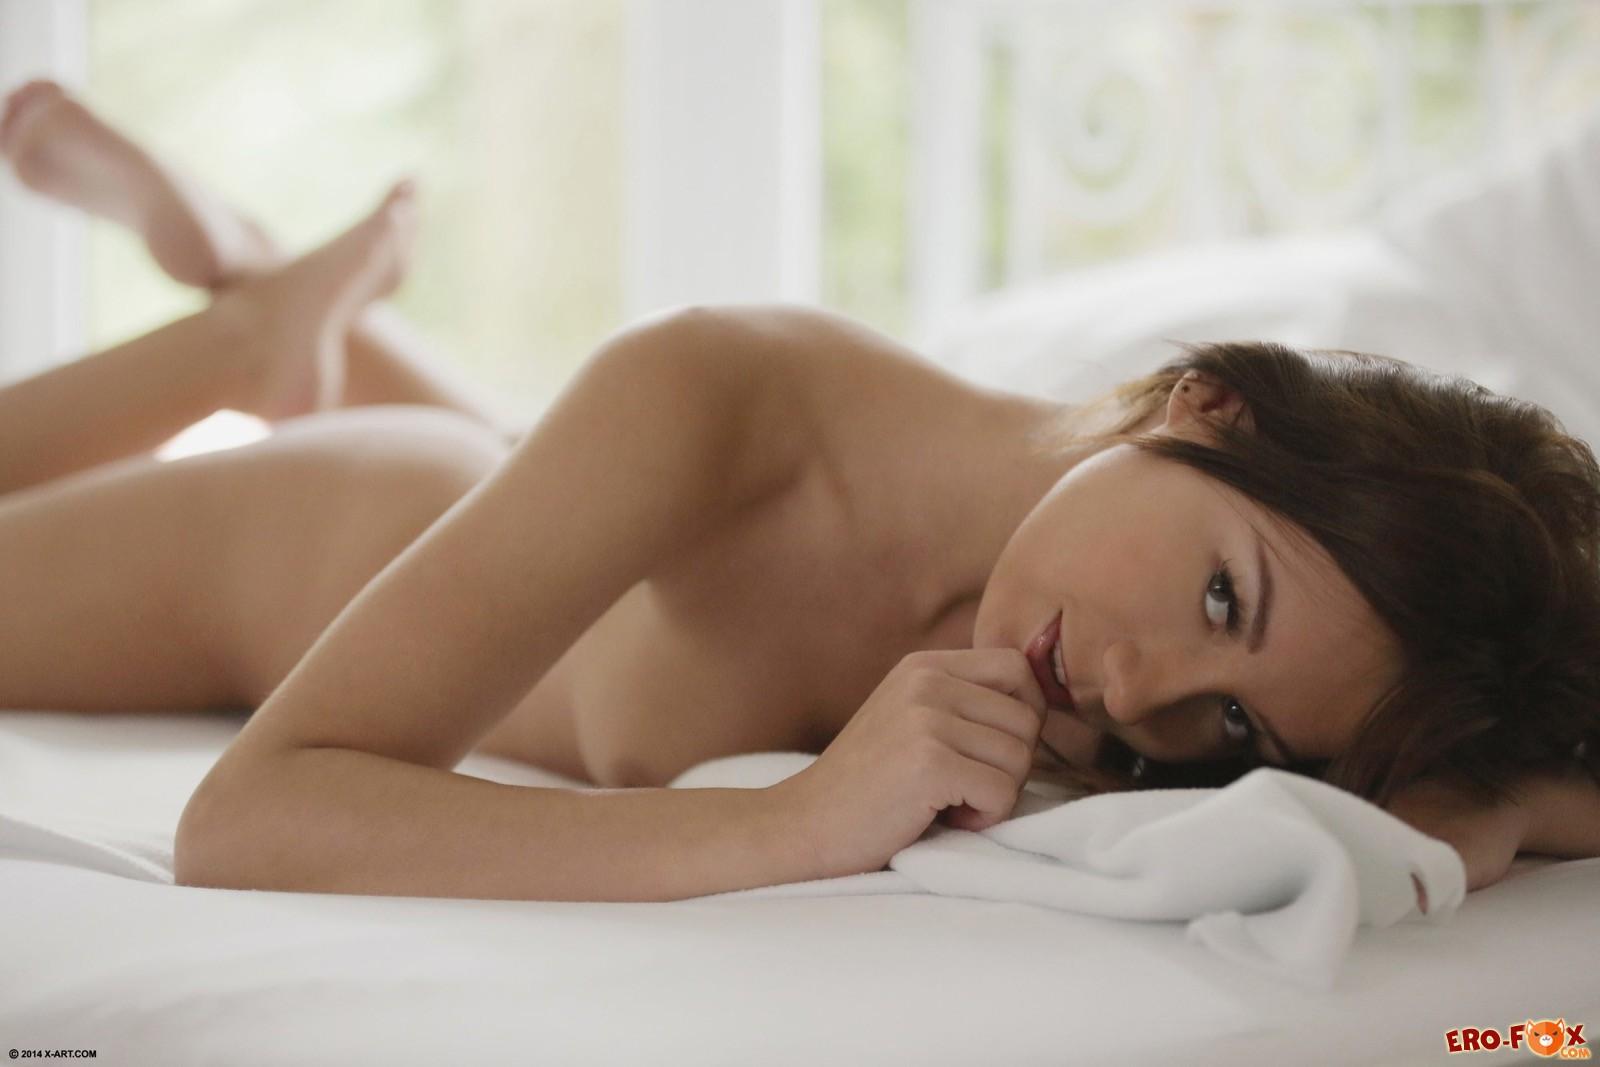 Симпатичная шатенка с голыми сиськами в постели